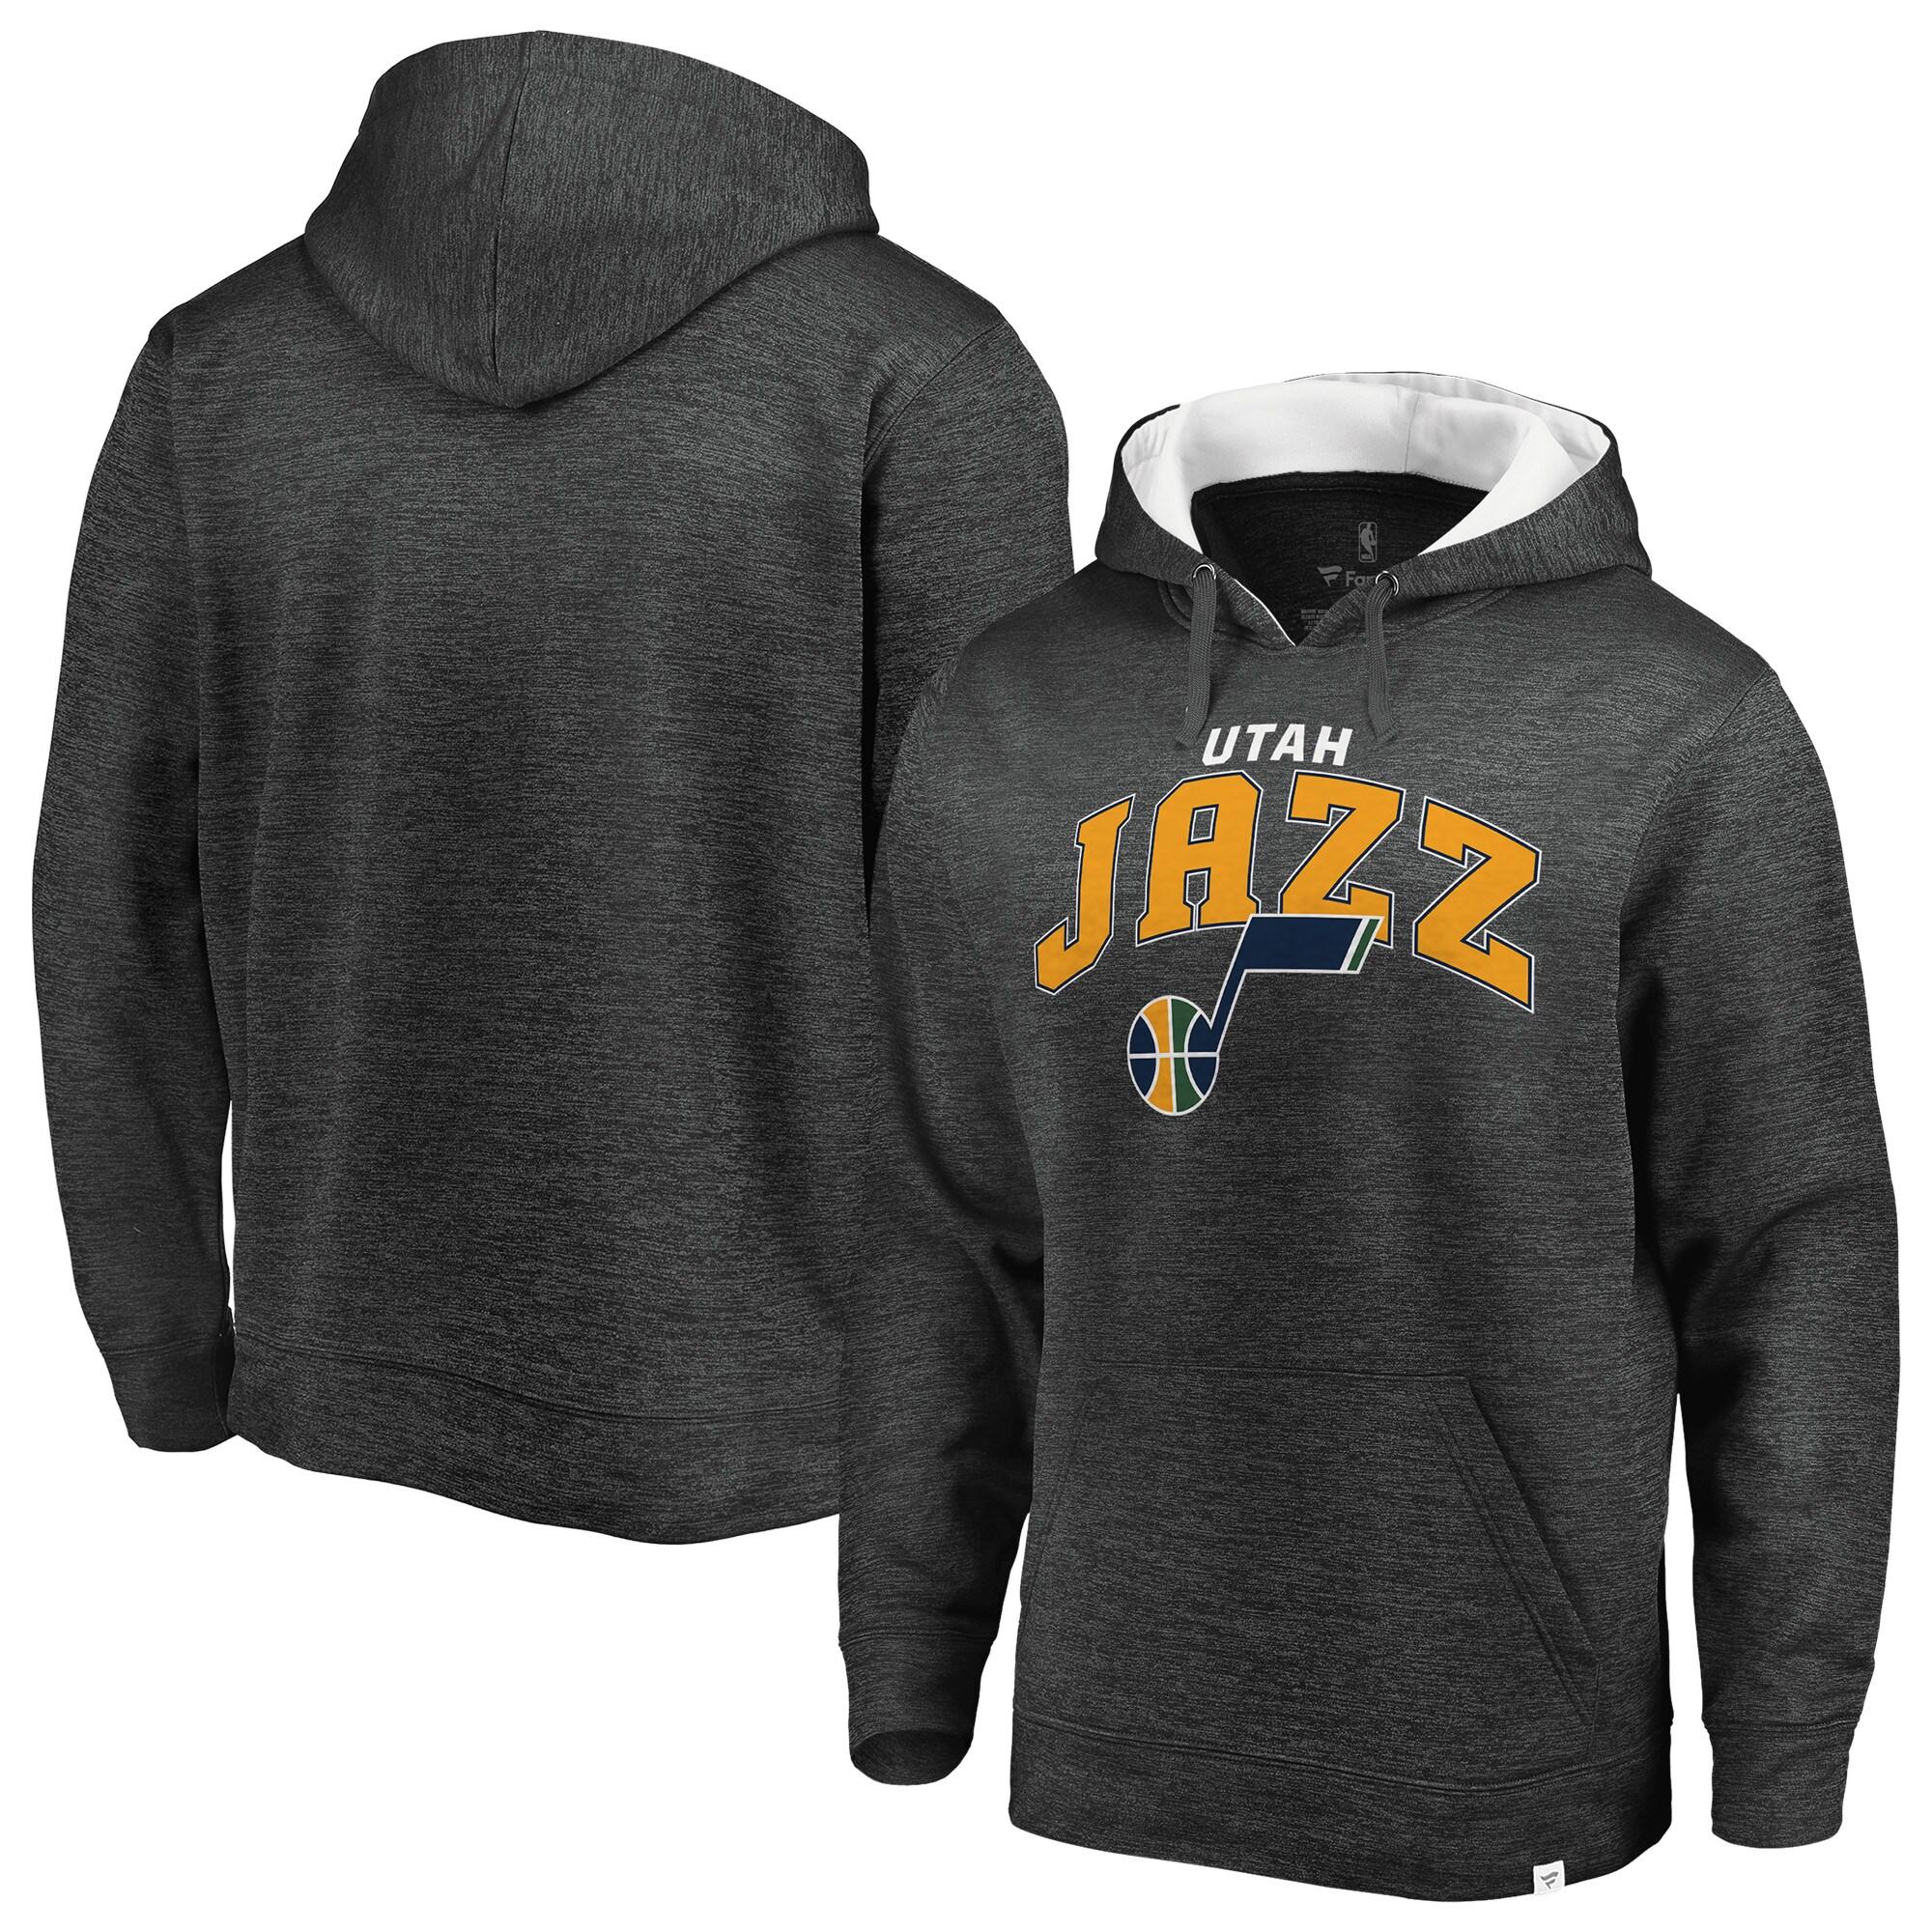 Utah Jazz Fanatics Branded Big & Tall Steady Fleece Pullover Hoodie - Heathered Gray/White